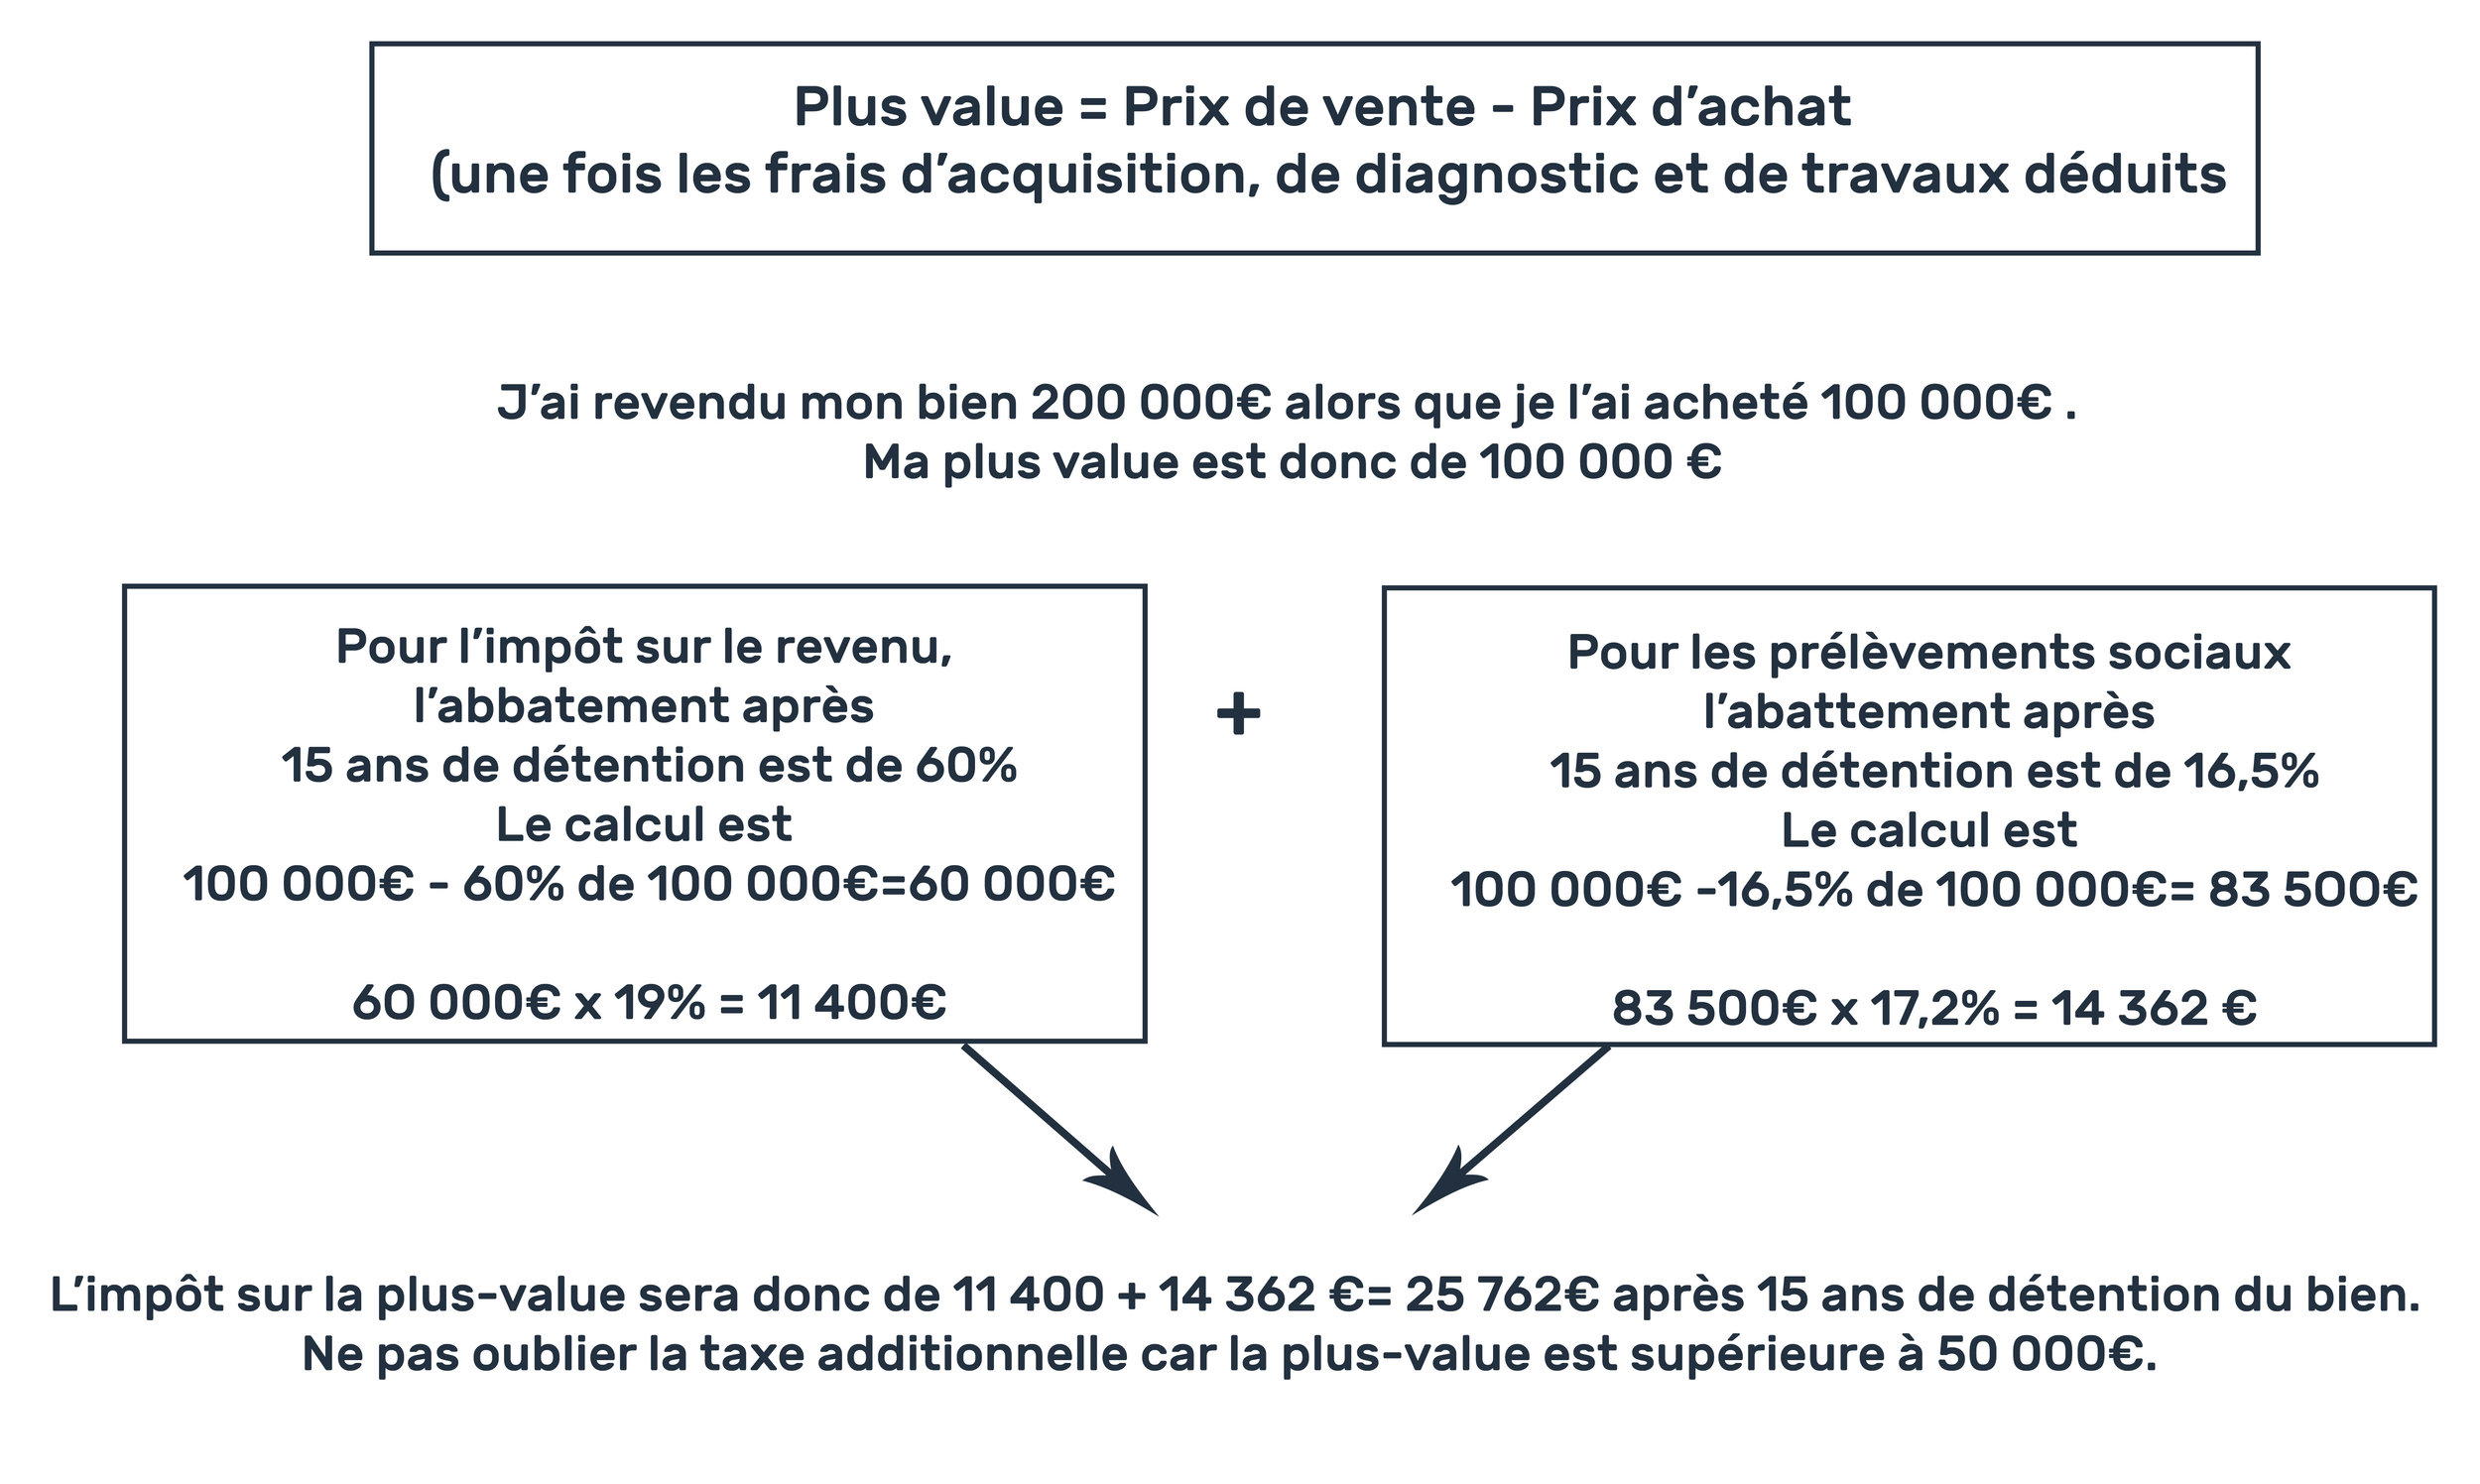 abattement-fiscal-plus-value